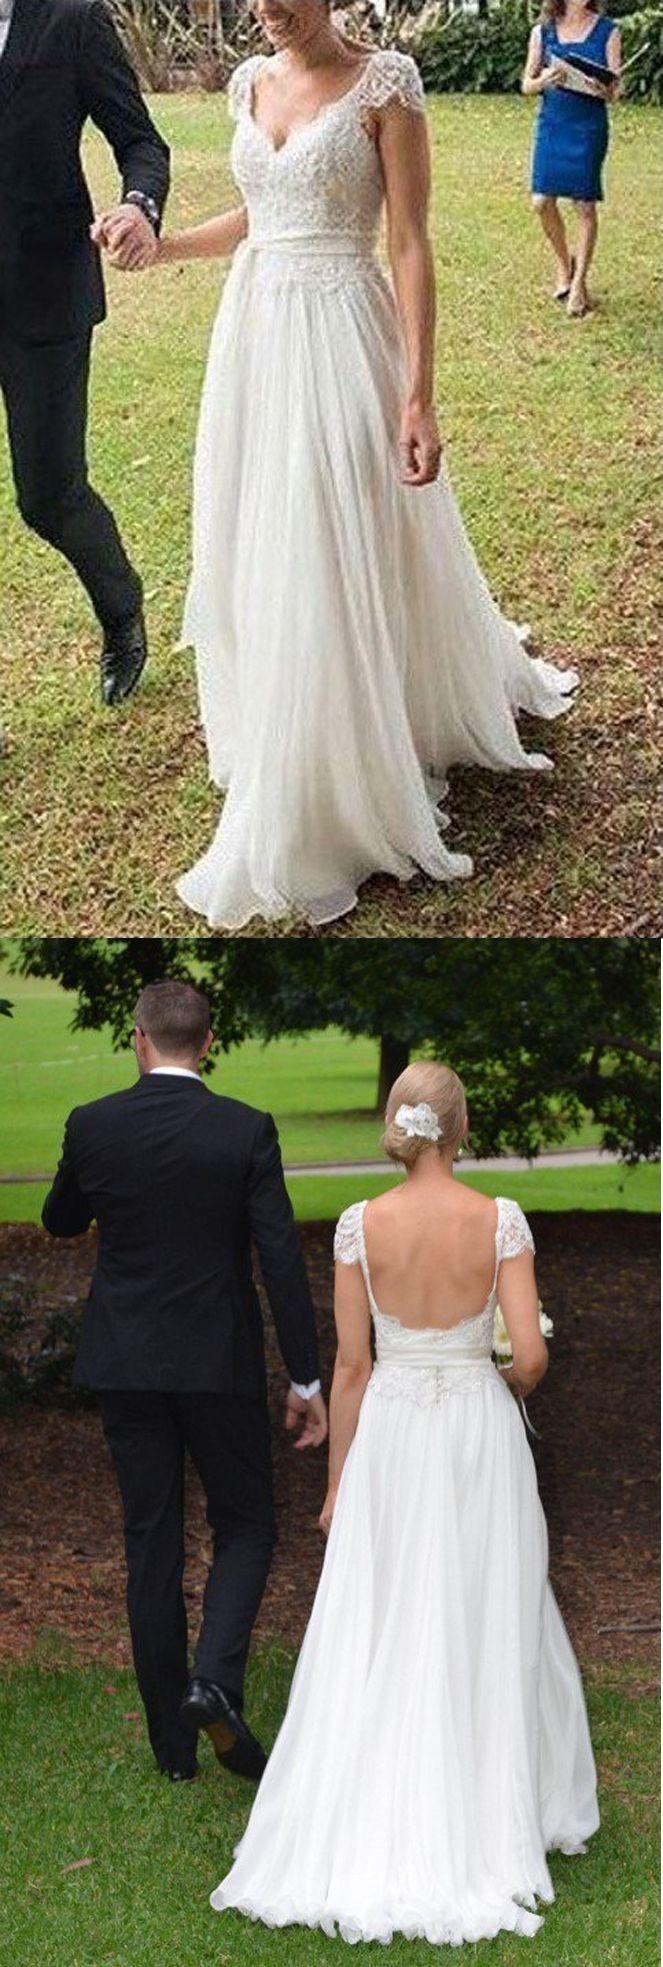 Chic New Arrival Wedding Dress,Romantic V-neck Wedding Dress 2017,A-line Cap Sleeves Wedding Gowns,Lace Ivory Chiffon Beach Wedding Dress,Wedding Dresses